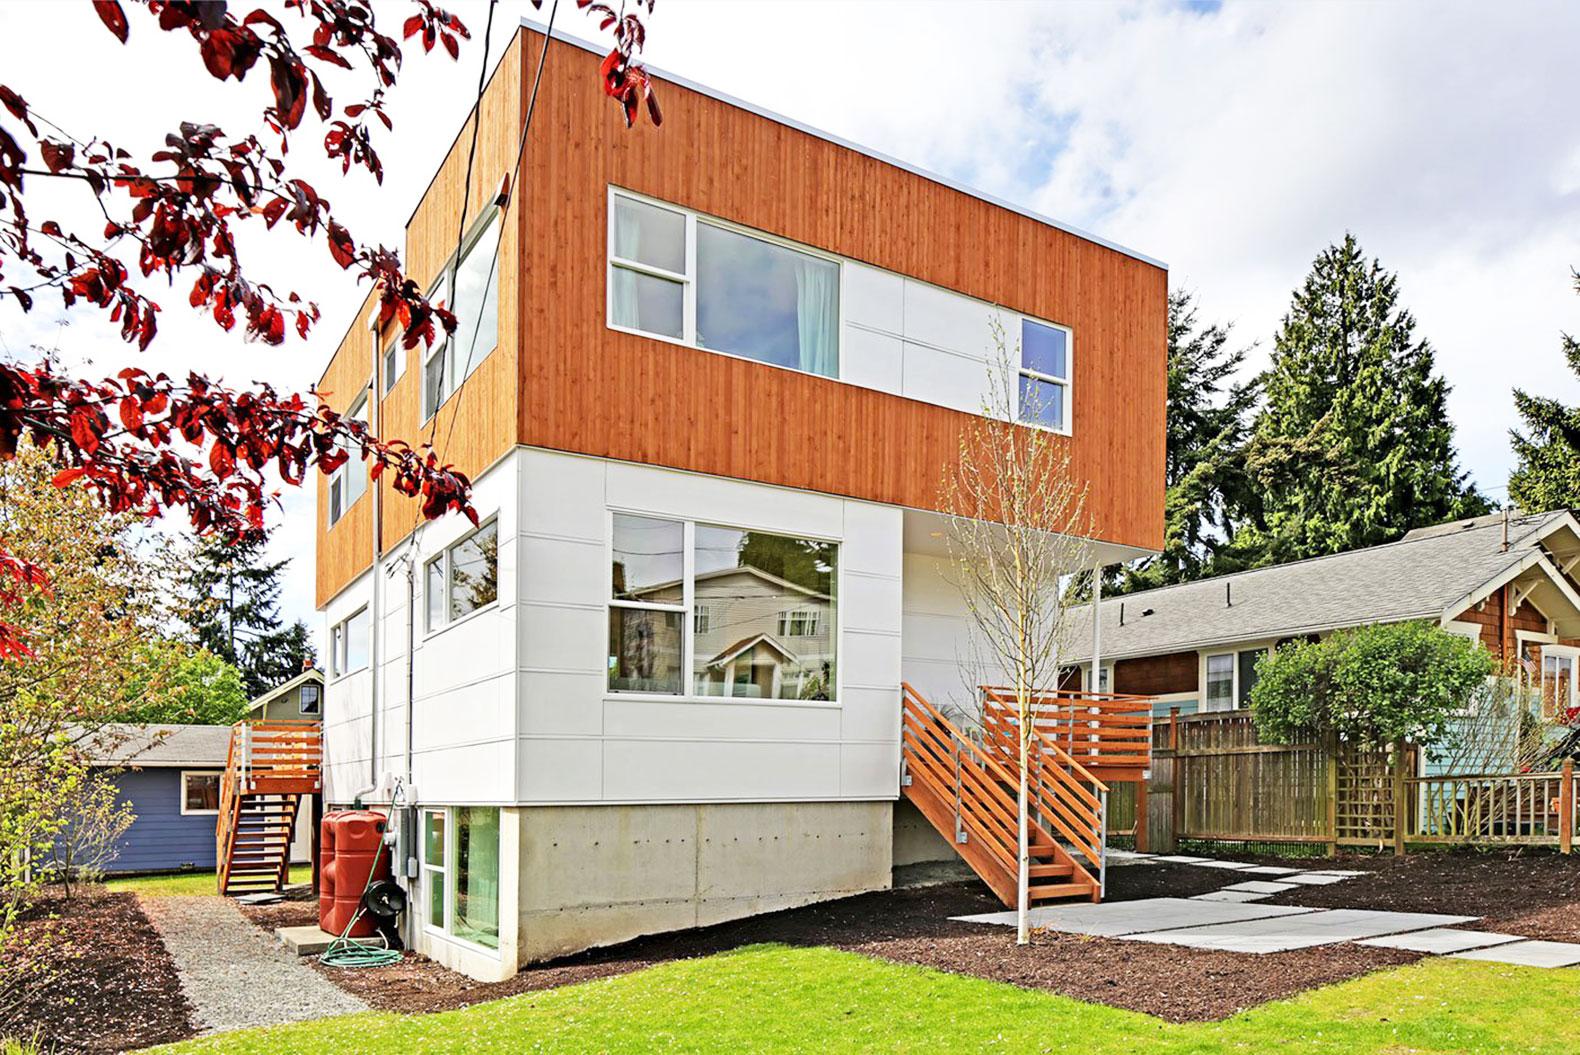 Best Kitchen Gallery: Energy Efficient Home Design Inhabitat Green Design Innovation of Green Building Home Designs  on rachelxblog.com